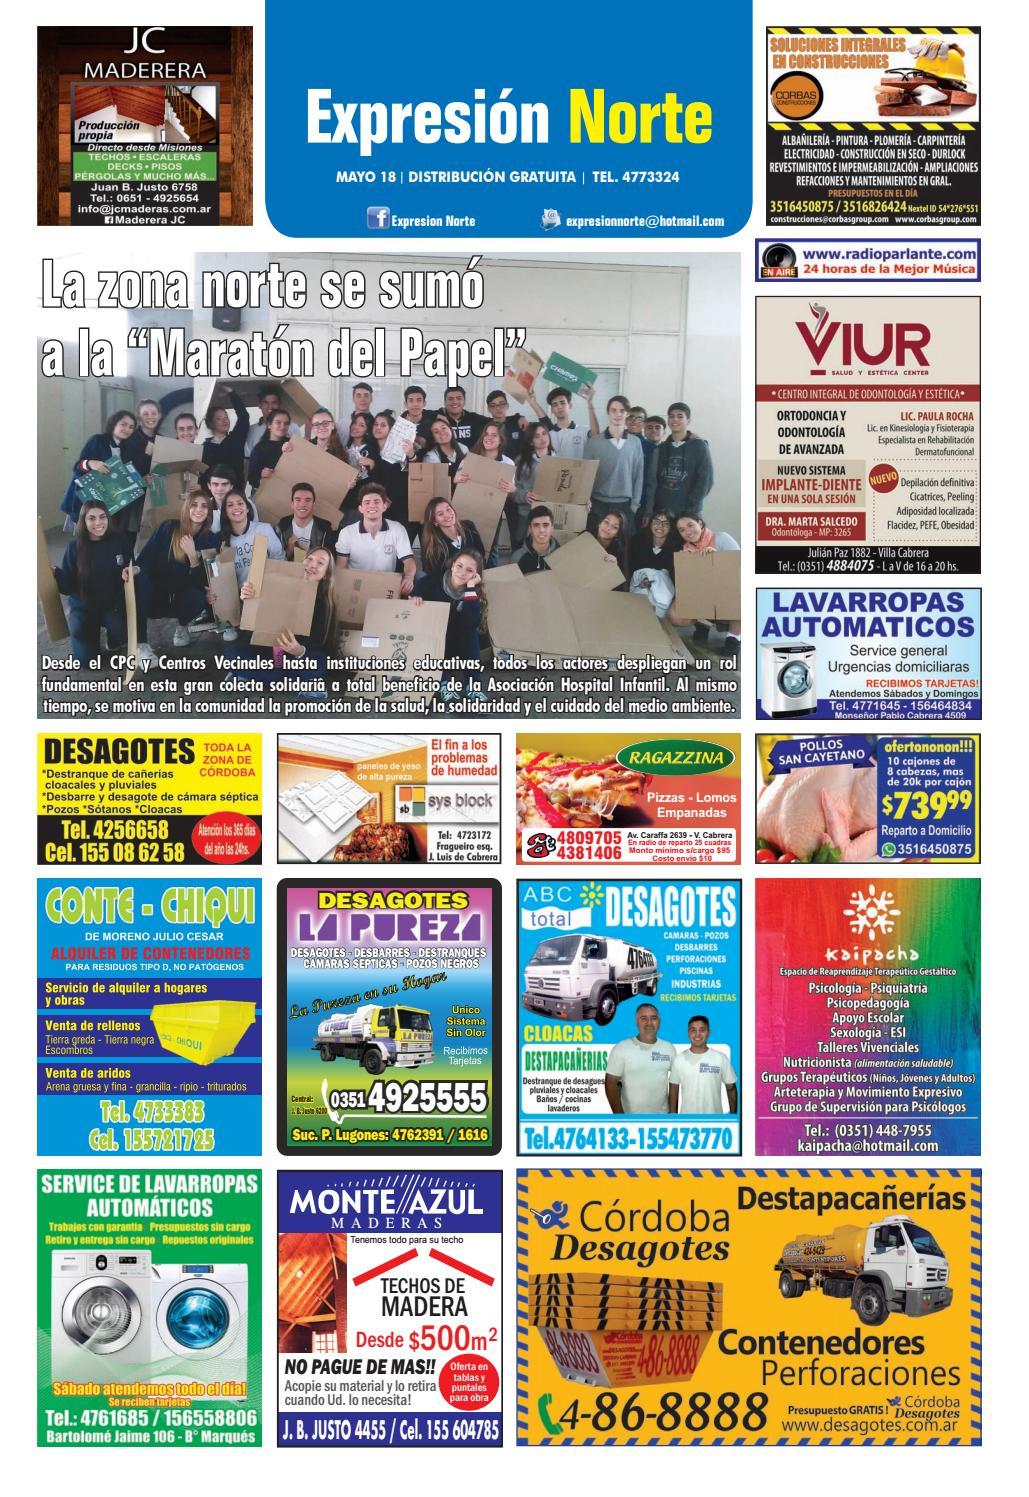 EXPRESION NORTE (Córdoba) - Edición MAYO 2018 by Fiestas & Sucesos ...